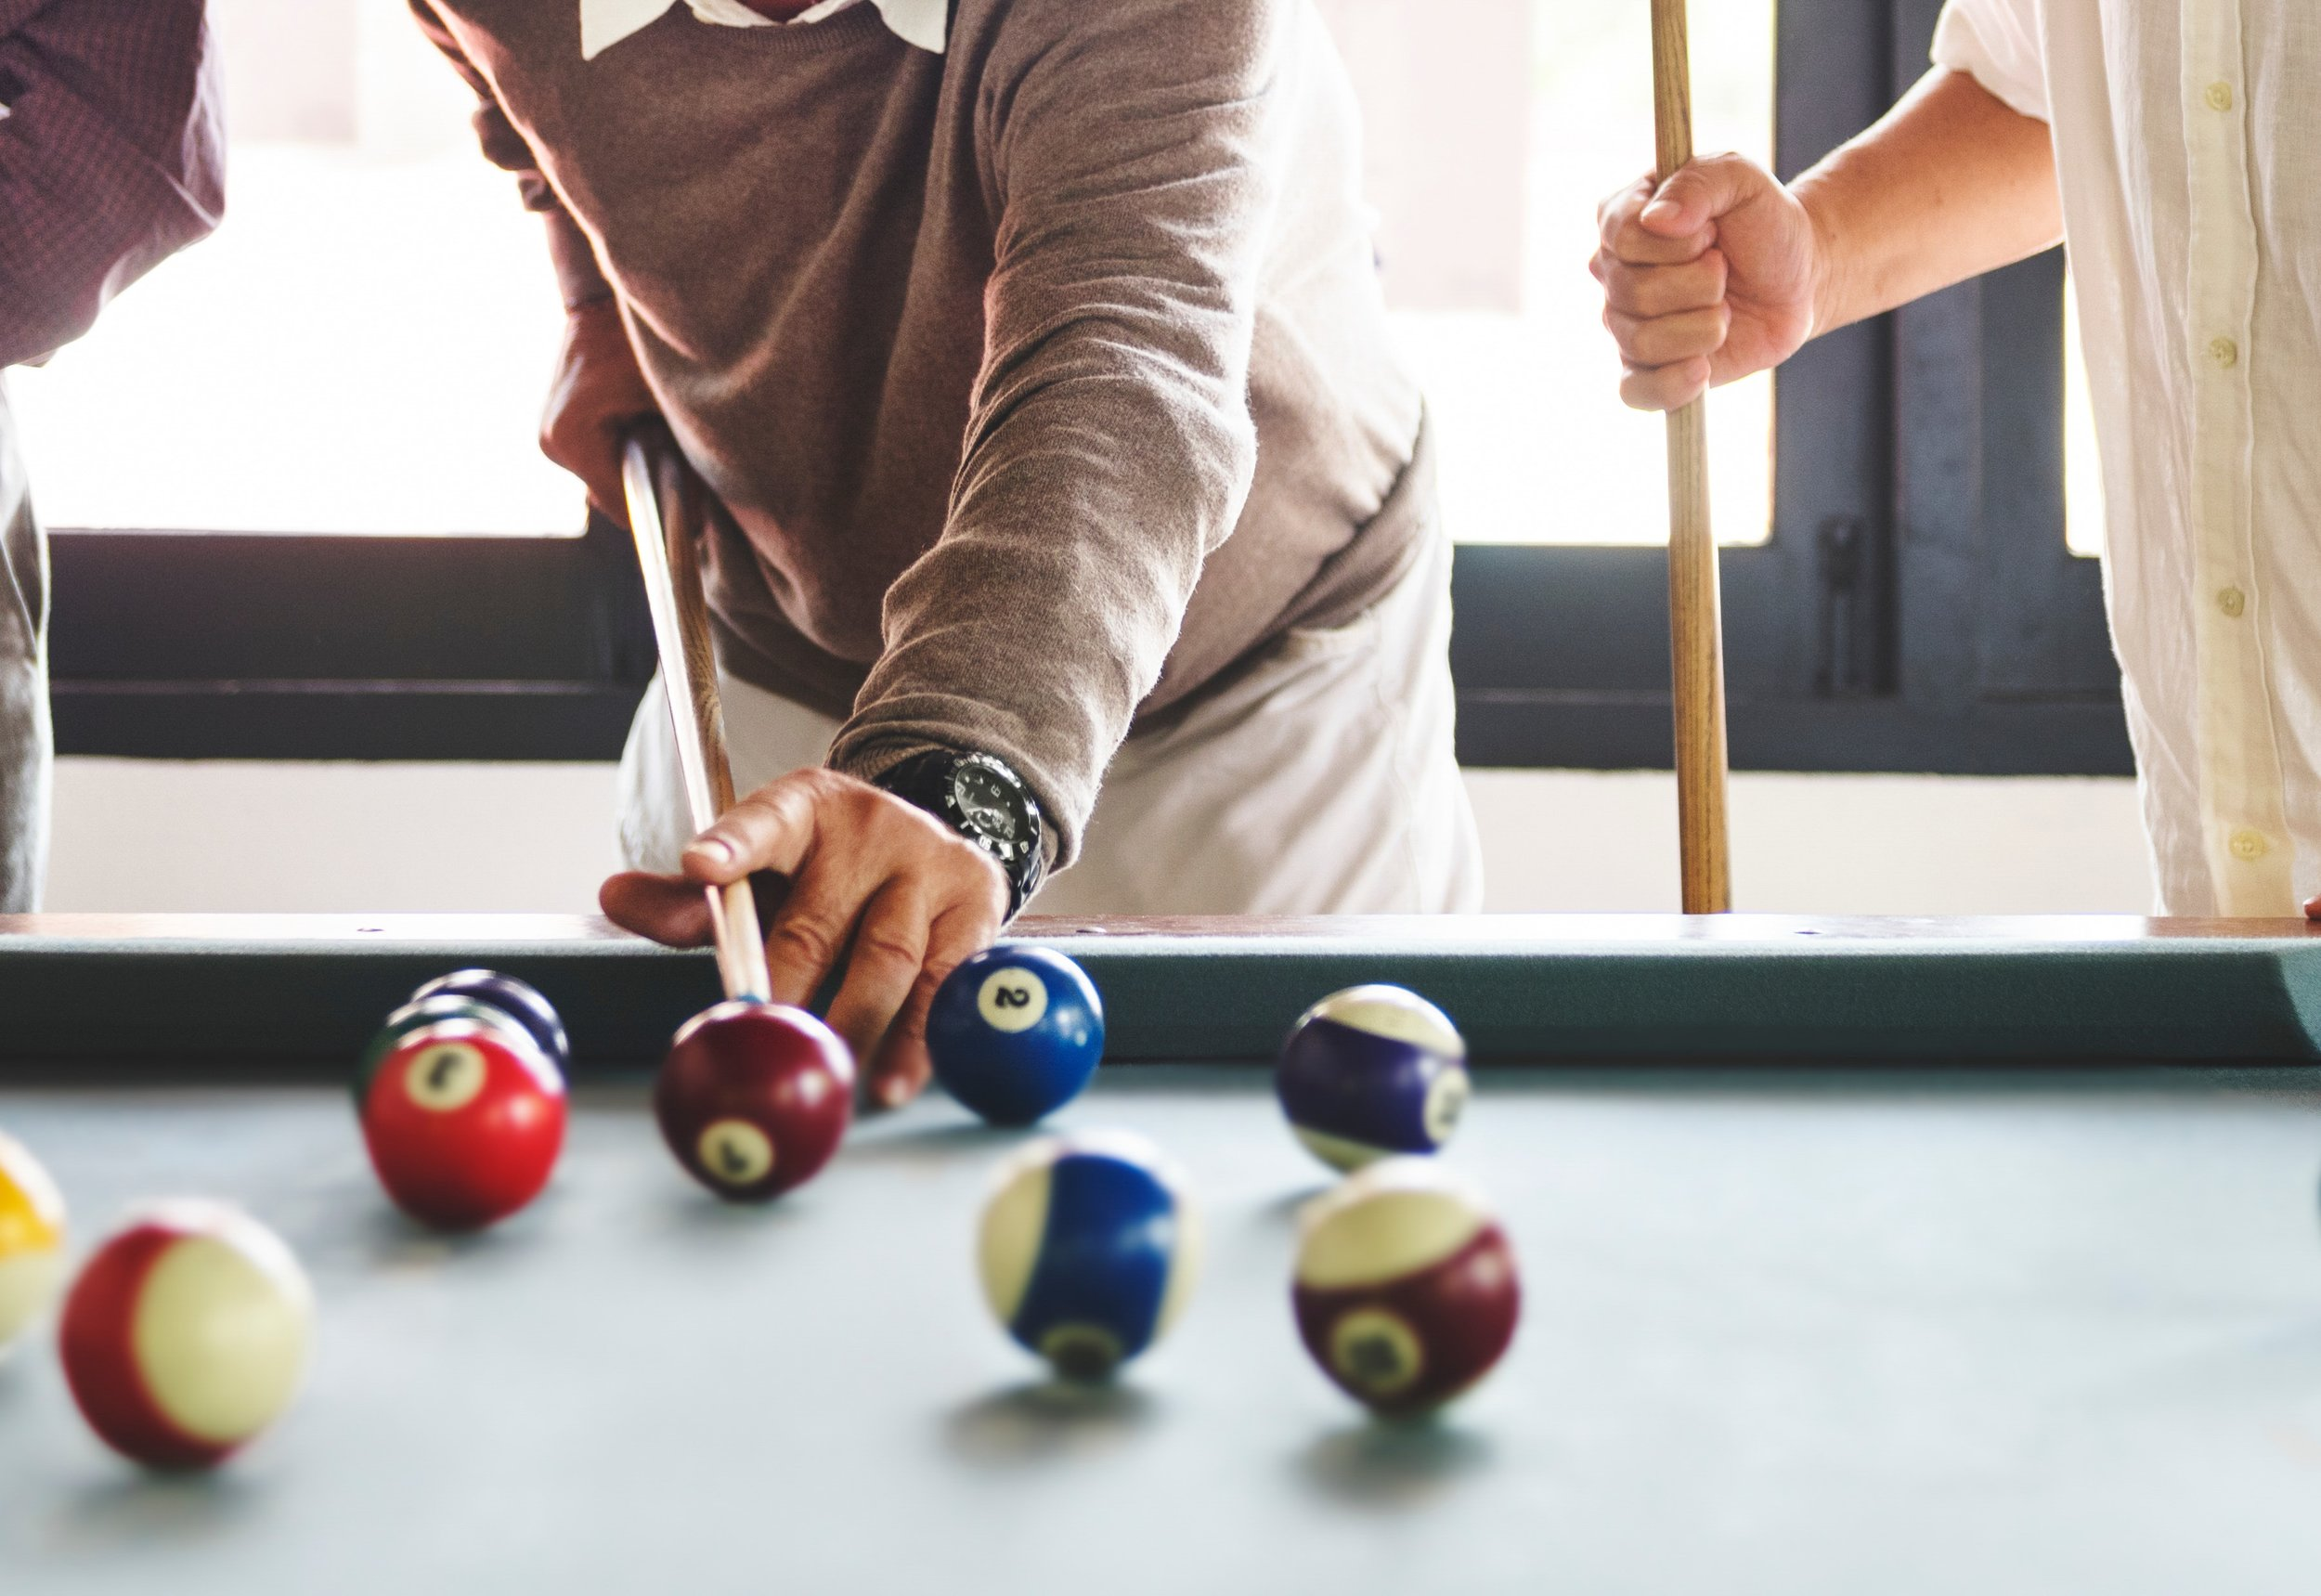 adult-balls-billiards-1251181.jpg